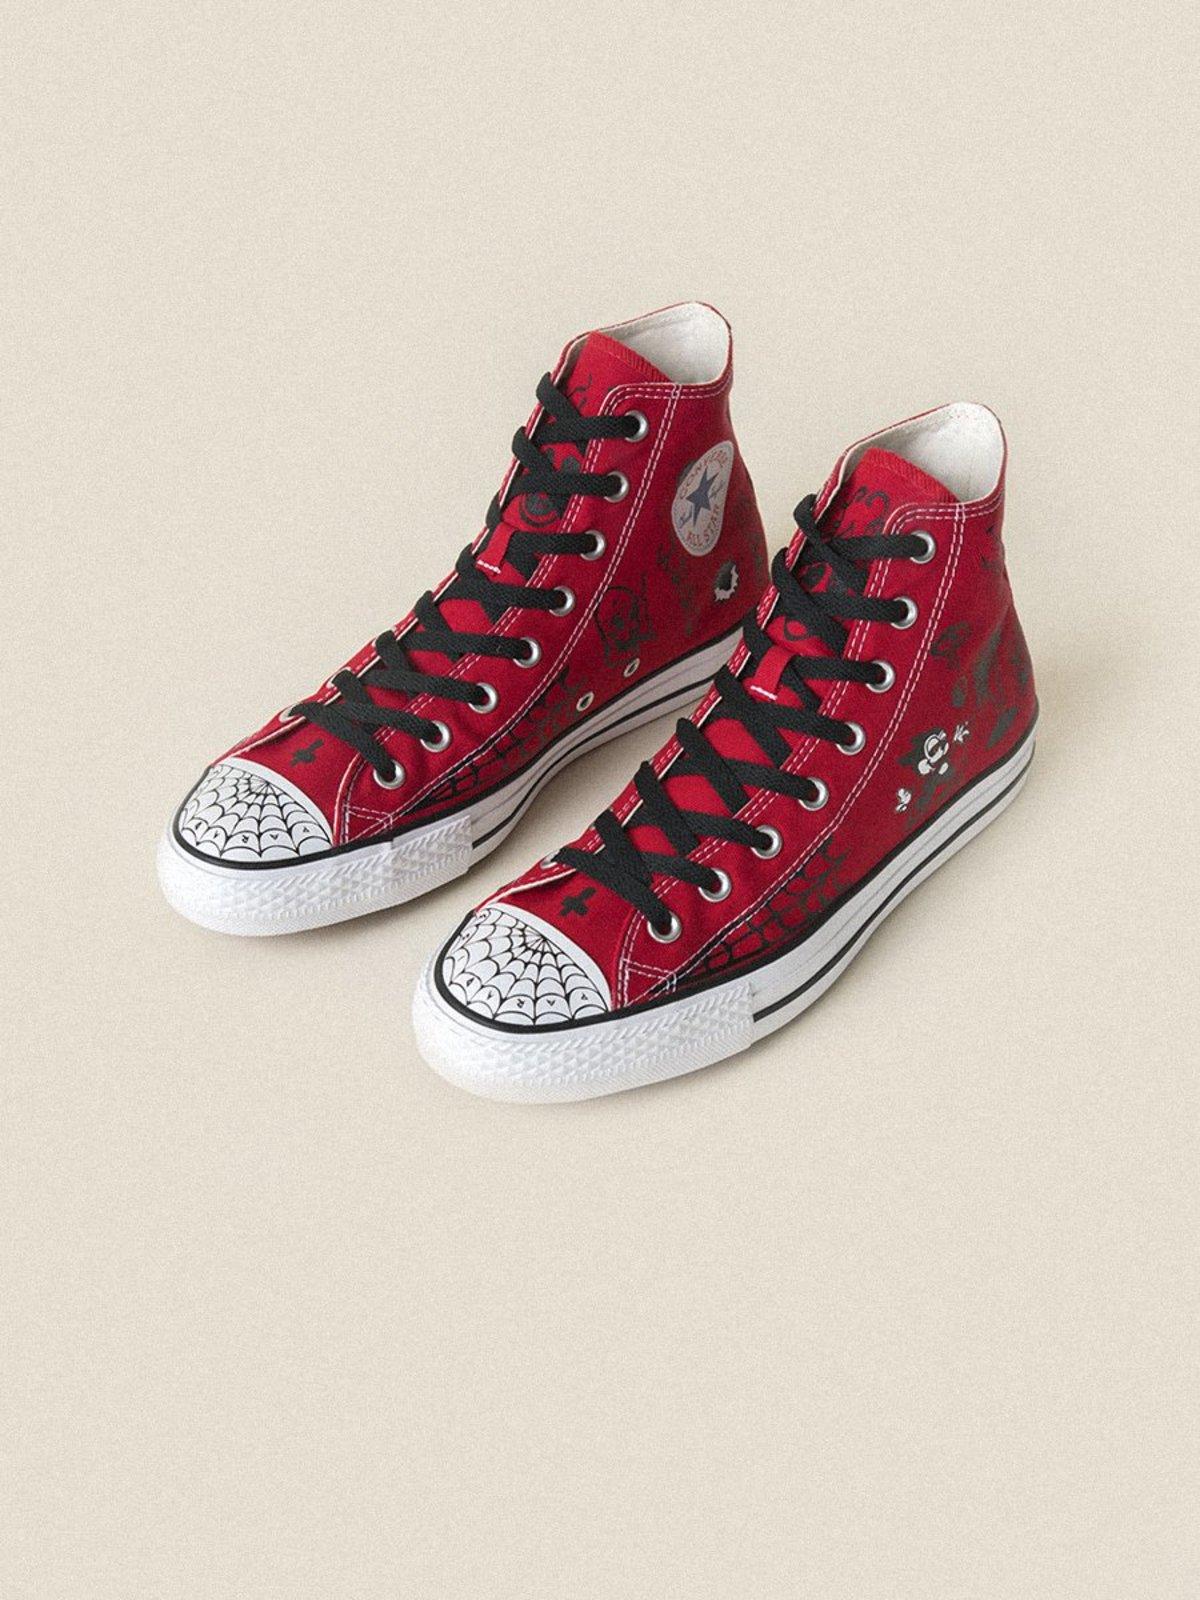 Converse Sean Pablo CTAS Pro Hi Sneakers - Enamel Red Black White ... 0e3c13756